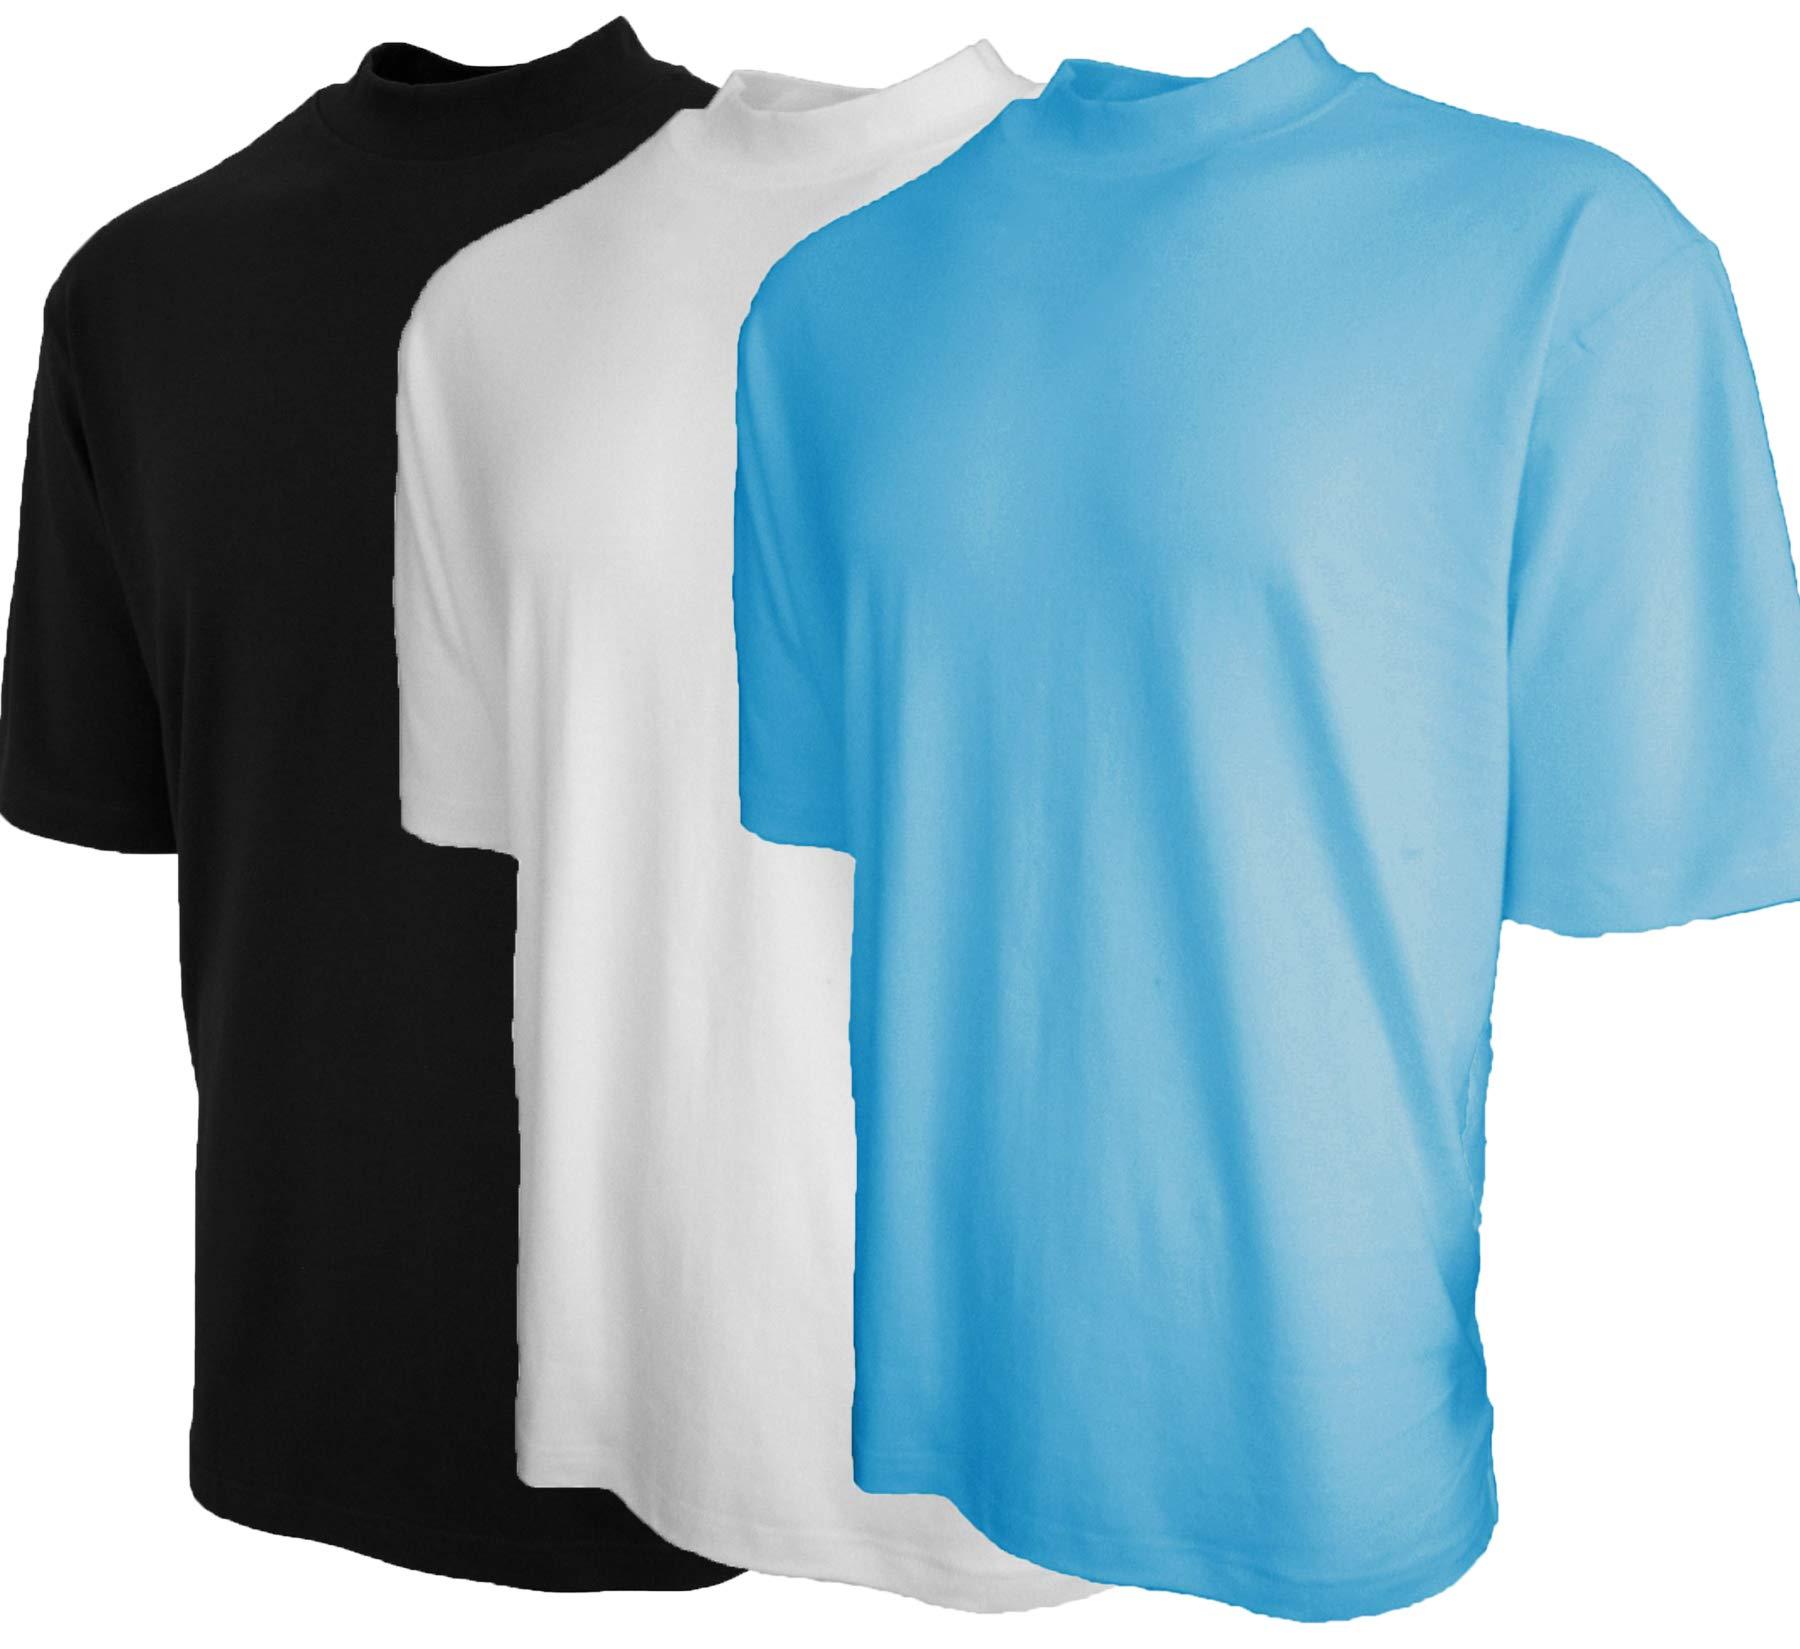 Good Life Mock Turtleneck Shirt 100% Cotton Short Sleeve Pre-Shrunk 3-Pack (XL, Black/White/SkyBlue 3-Pack)